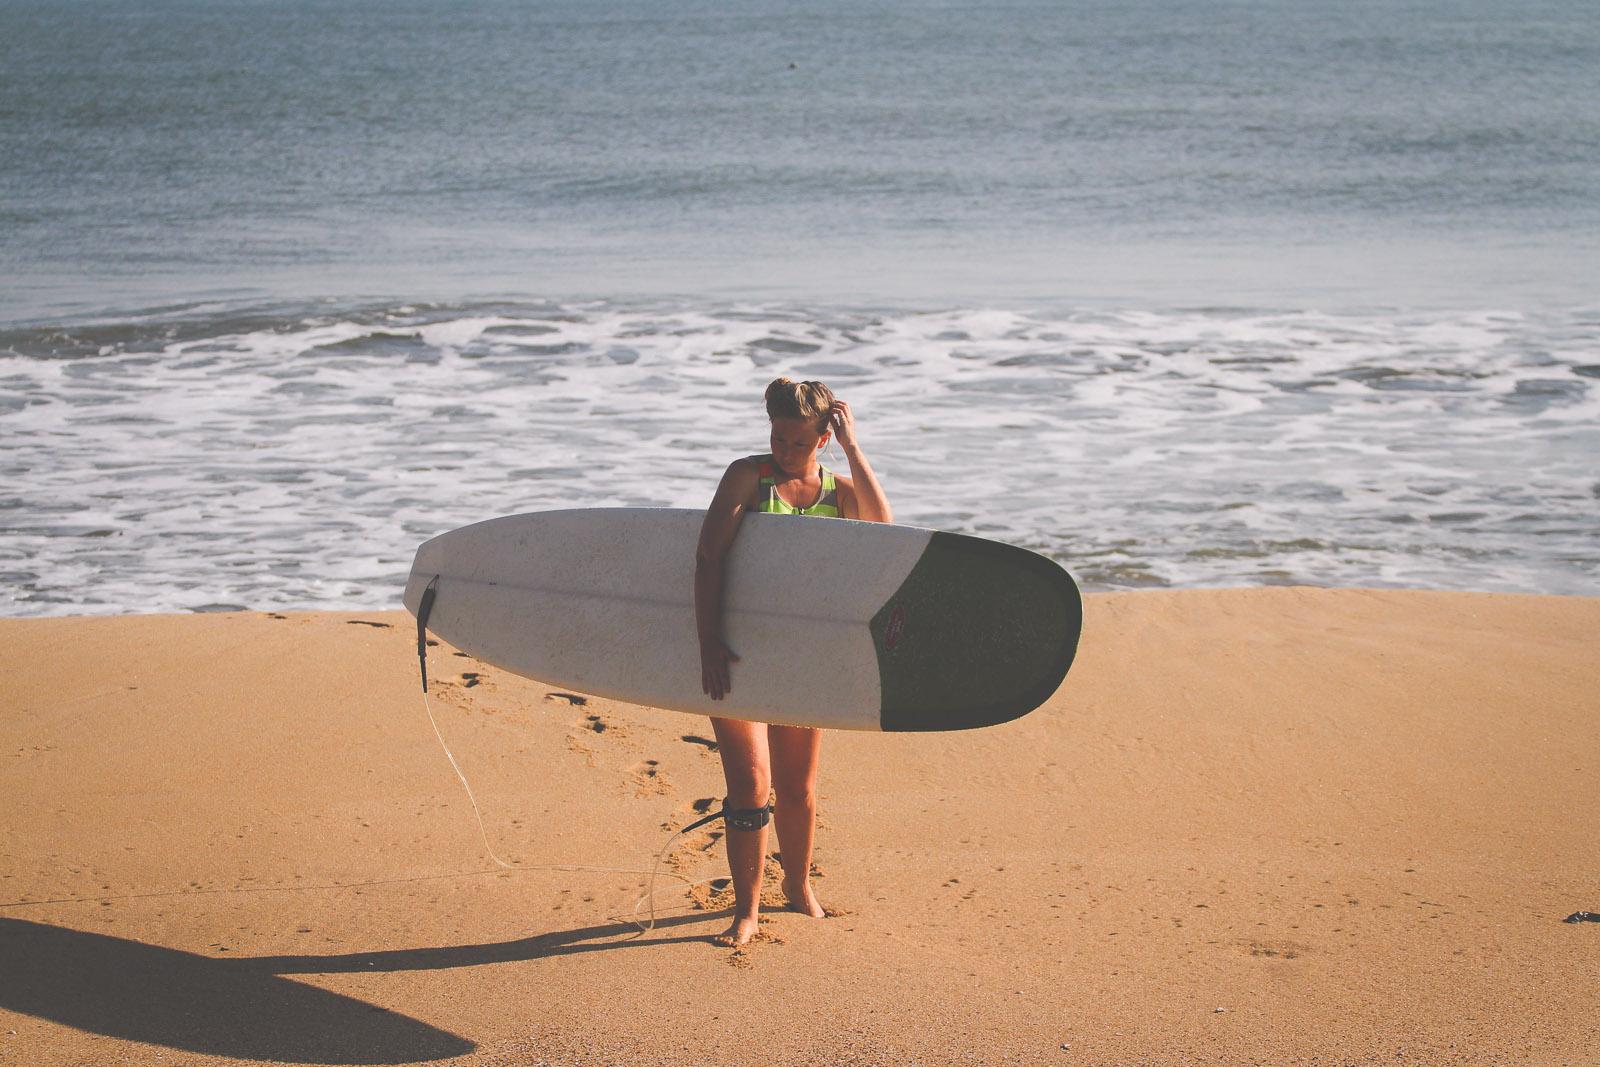 Sunshinestories-surf-travel-blog-IMG_9205